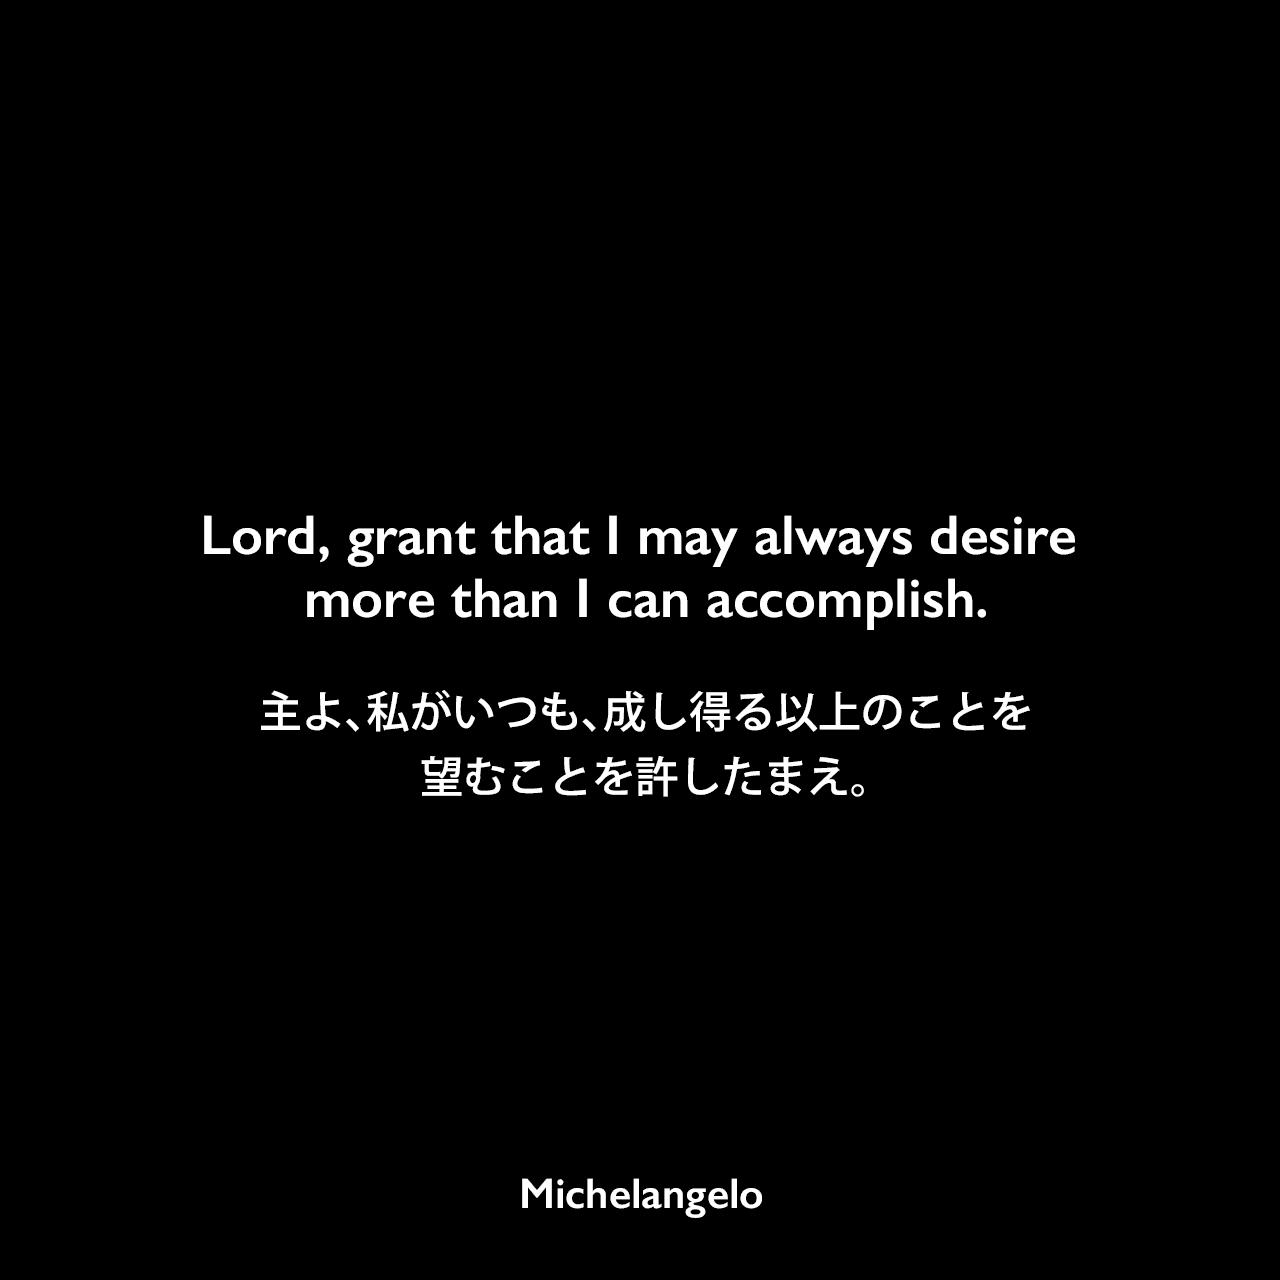 Lord, grant that I may always desire more than I can accomplish.主よ、私がいつも、成し得る以上のことを望むことを許したまえ。Michelangelo